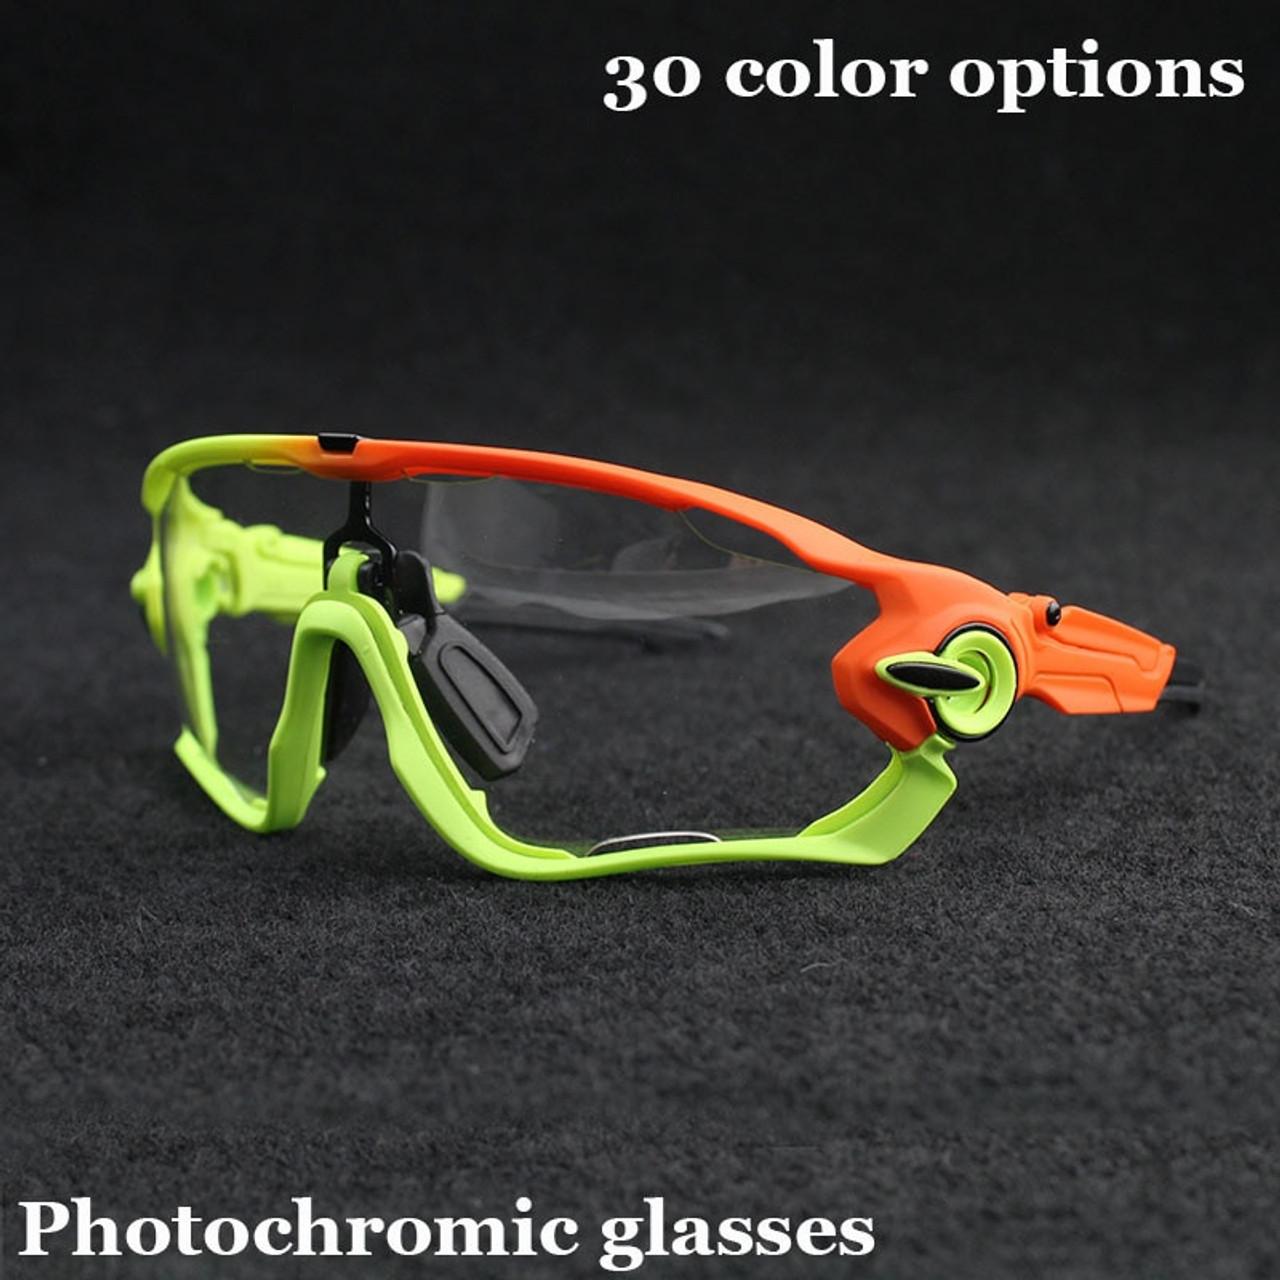 5bce24dff JBR Photochromic Cycling Glasses Men Women Sports MTB Mountain Road Bike  Bicycle Cycling Sunglasses Eyewear UV400 ...